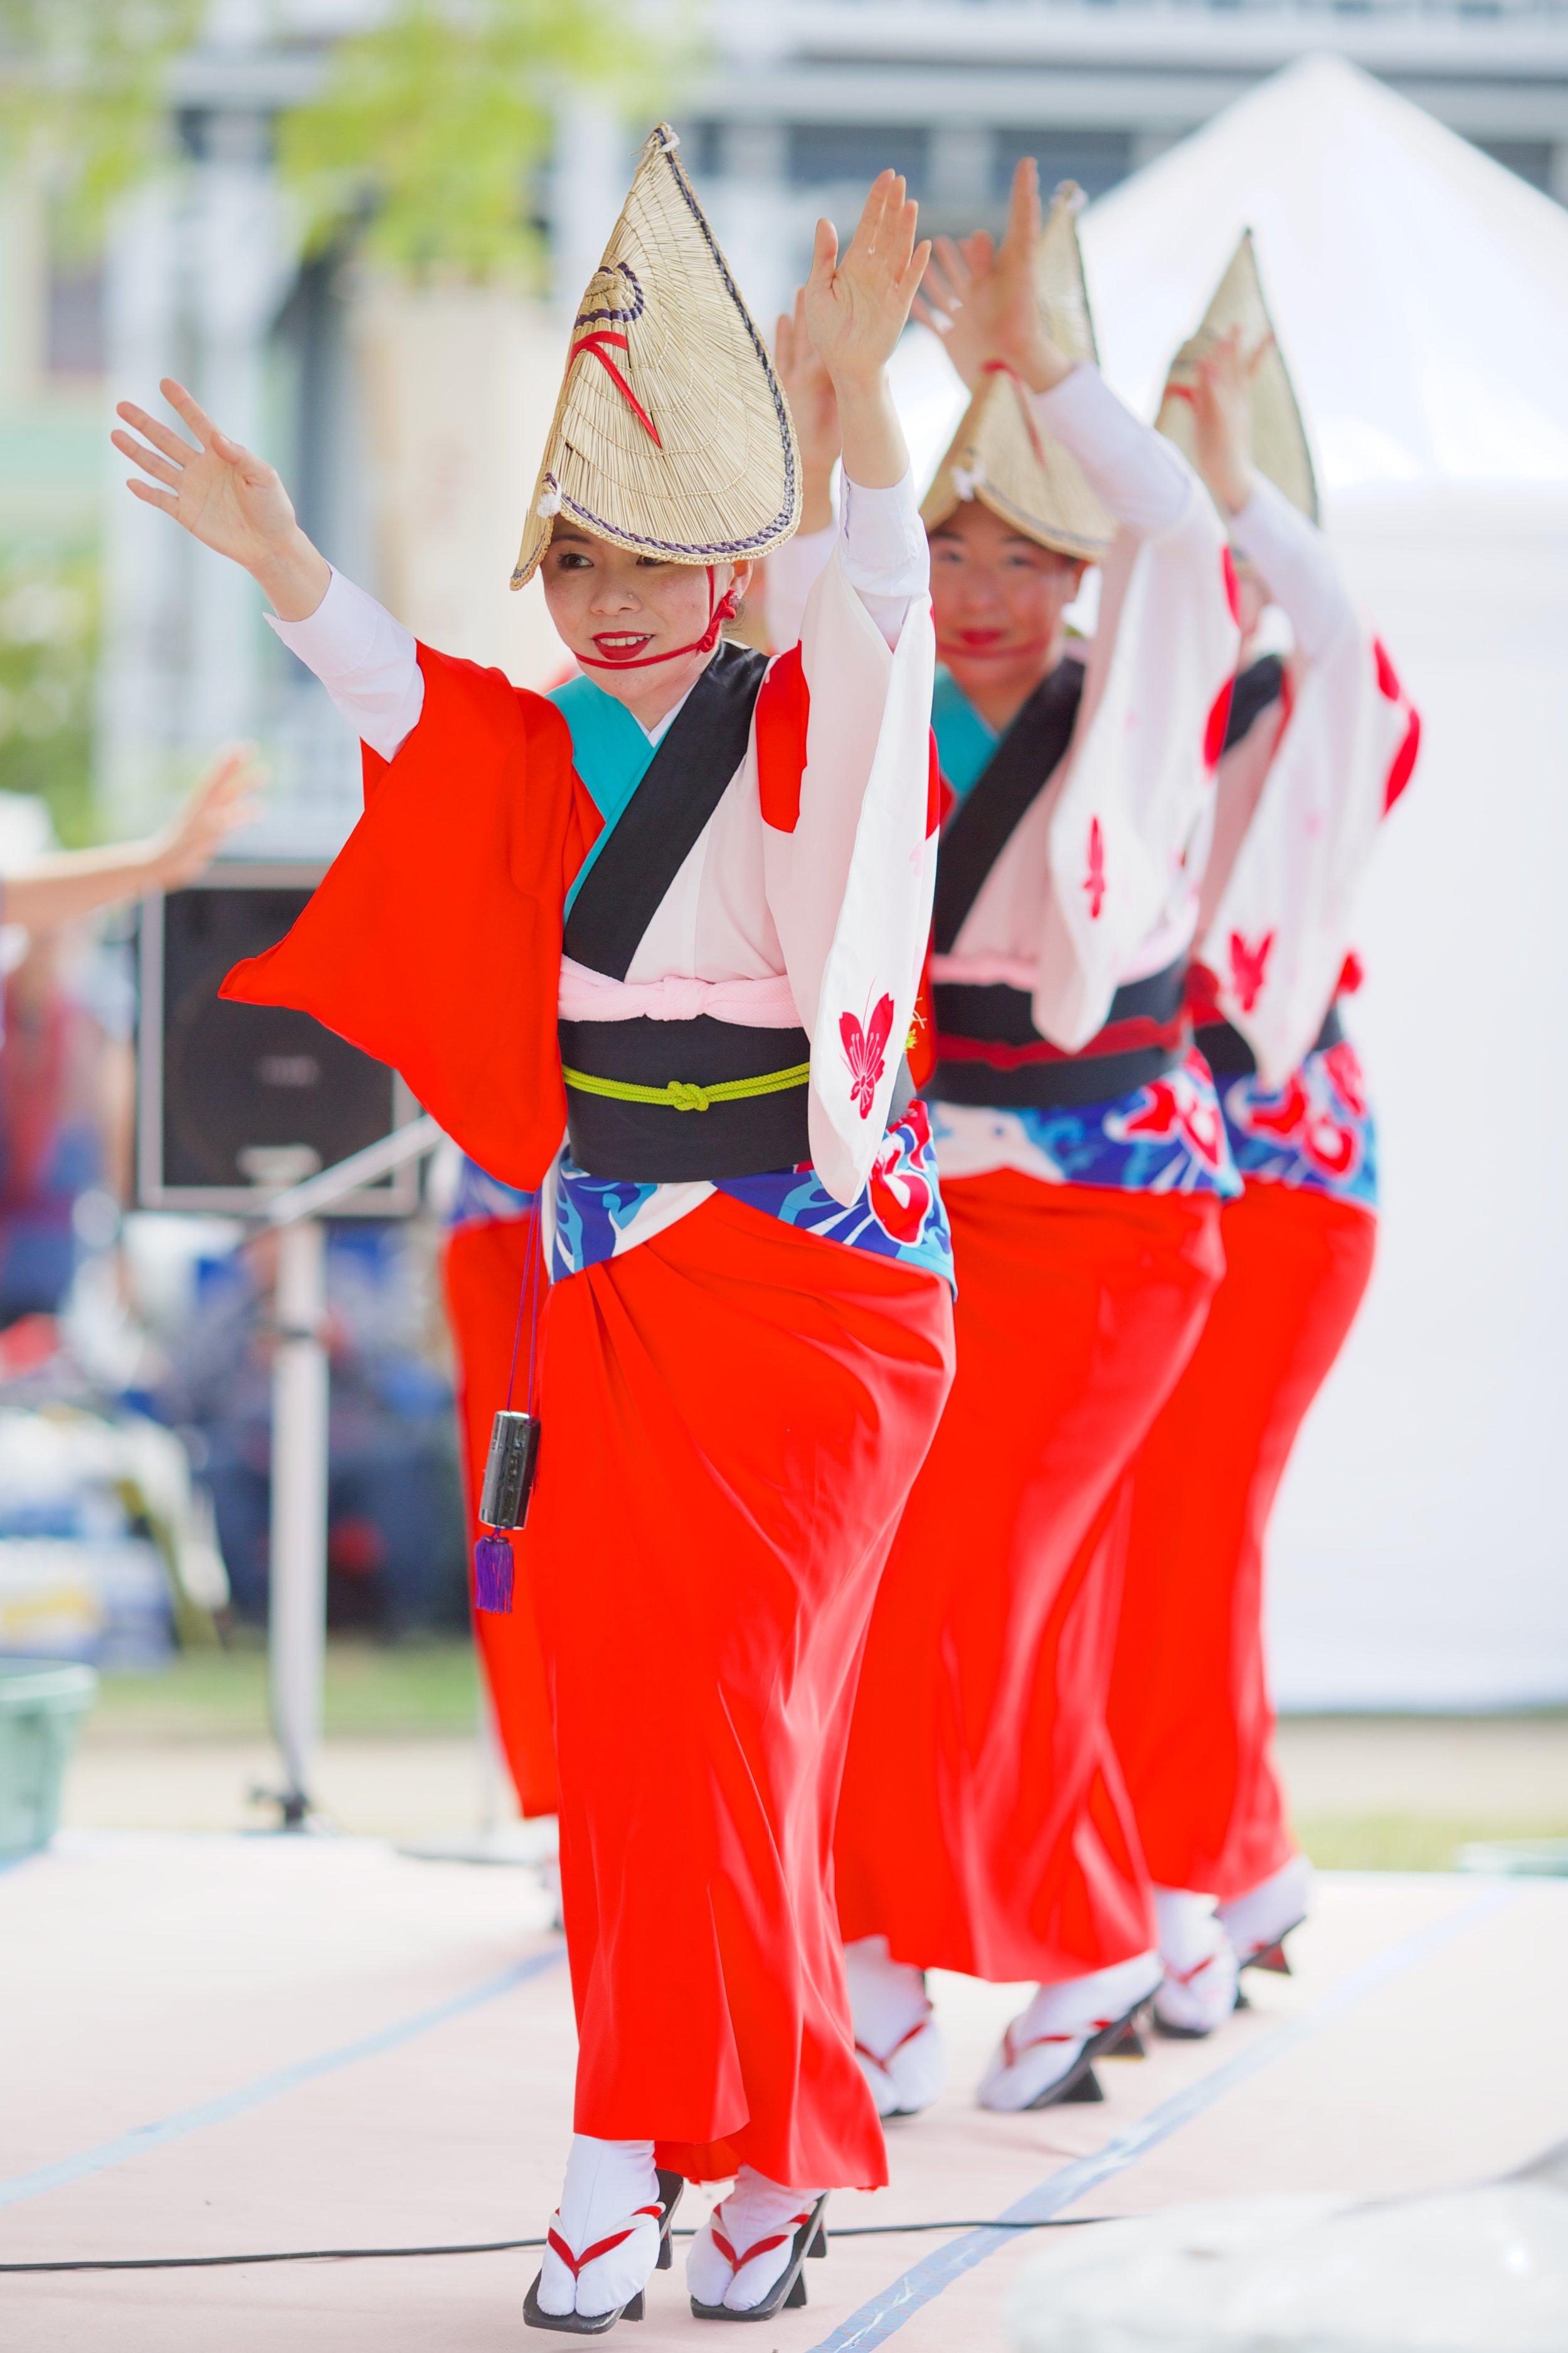 sakura-ren---japanese-cultural-fair-of-santa-cruz-2015_19410043799_o.jpg